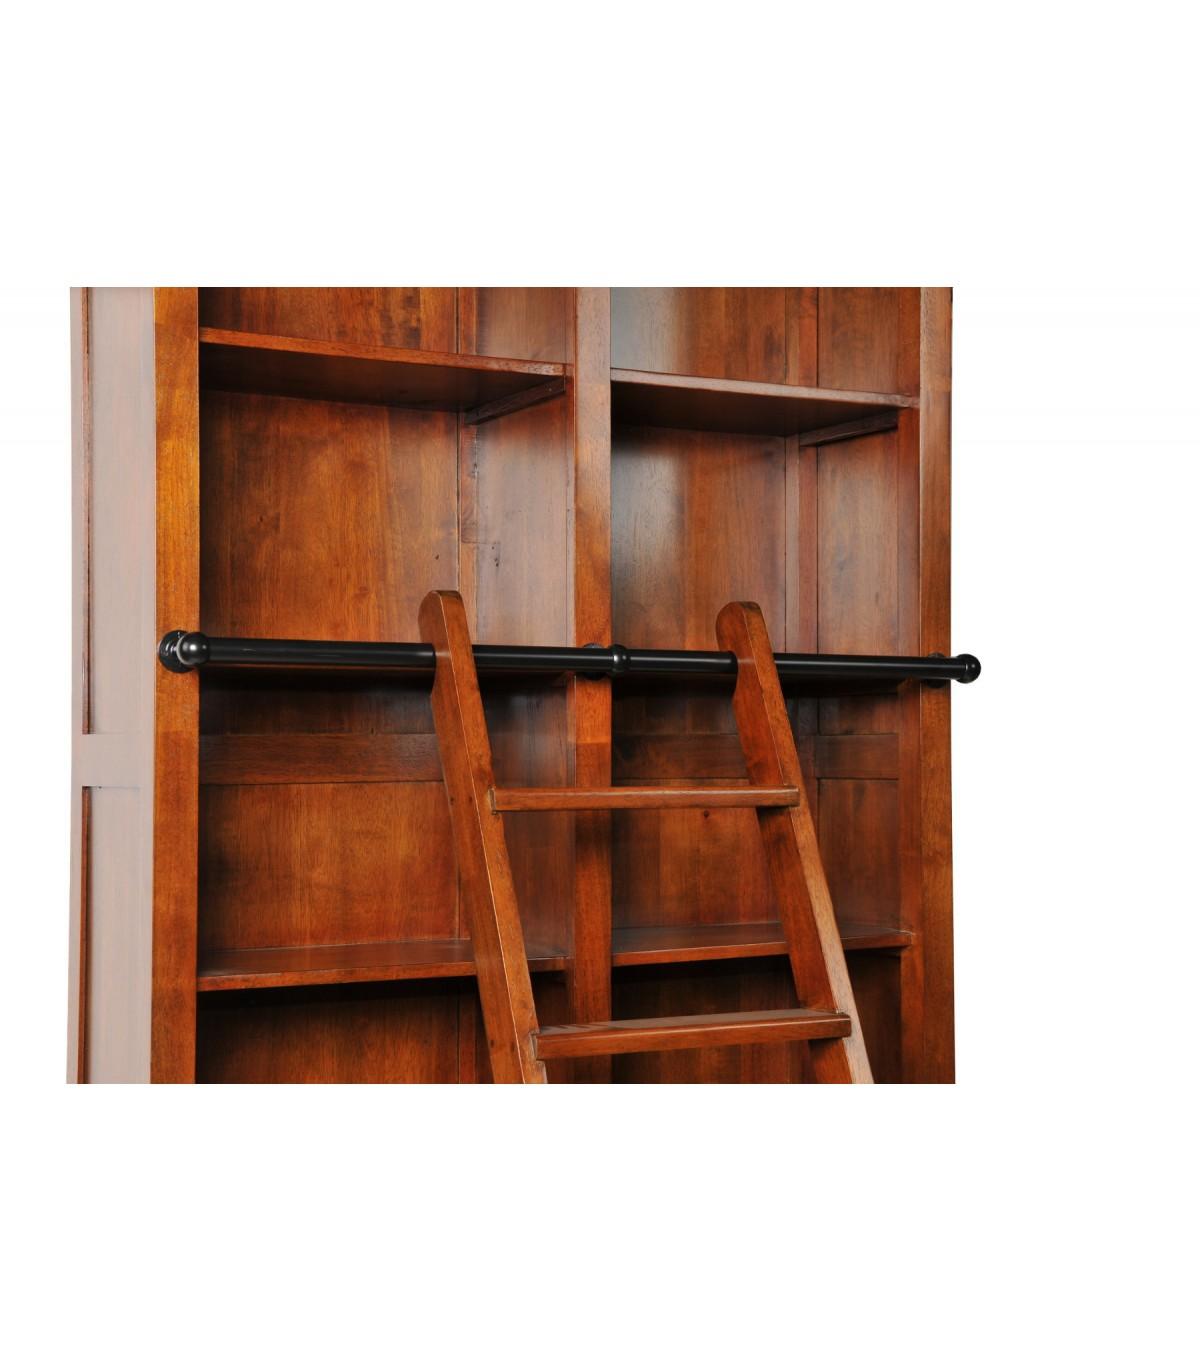 bibliotheque echelle bois classique meuble hevea beldeko